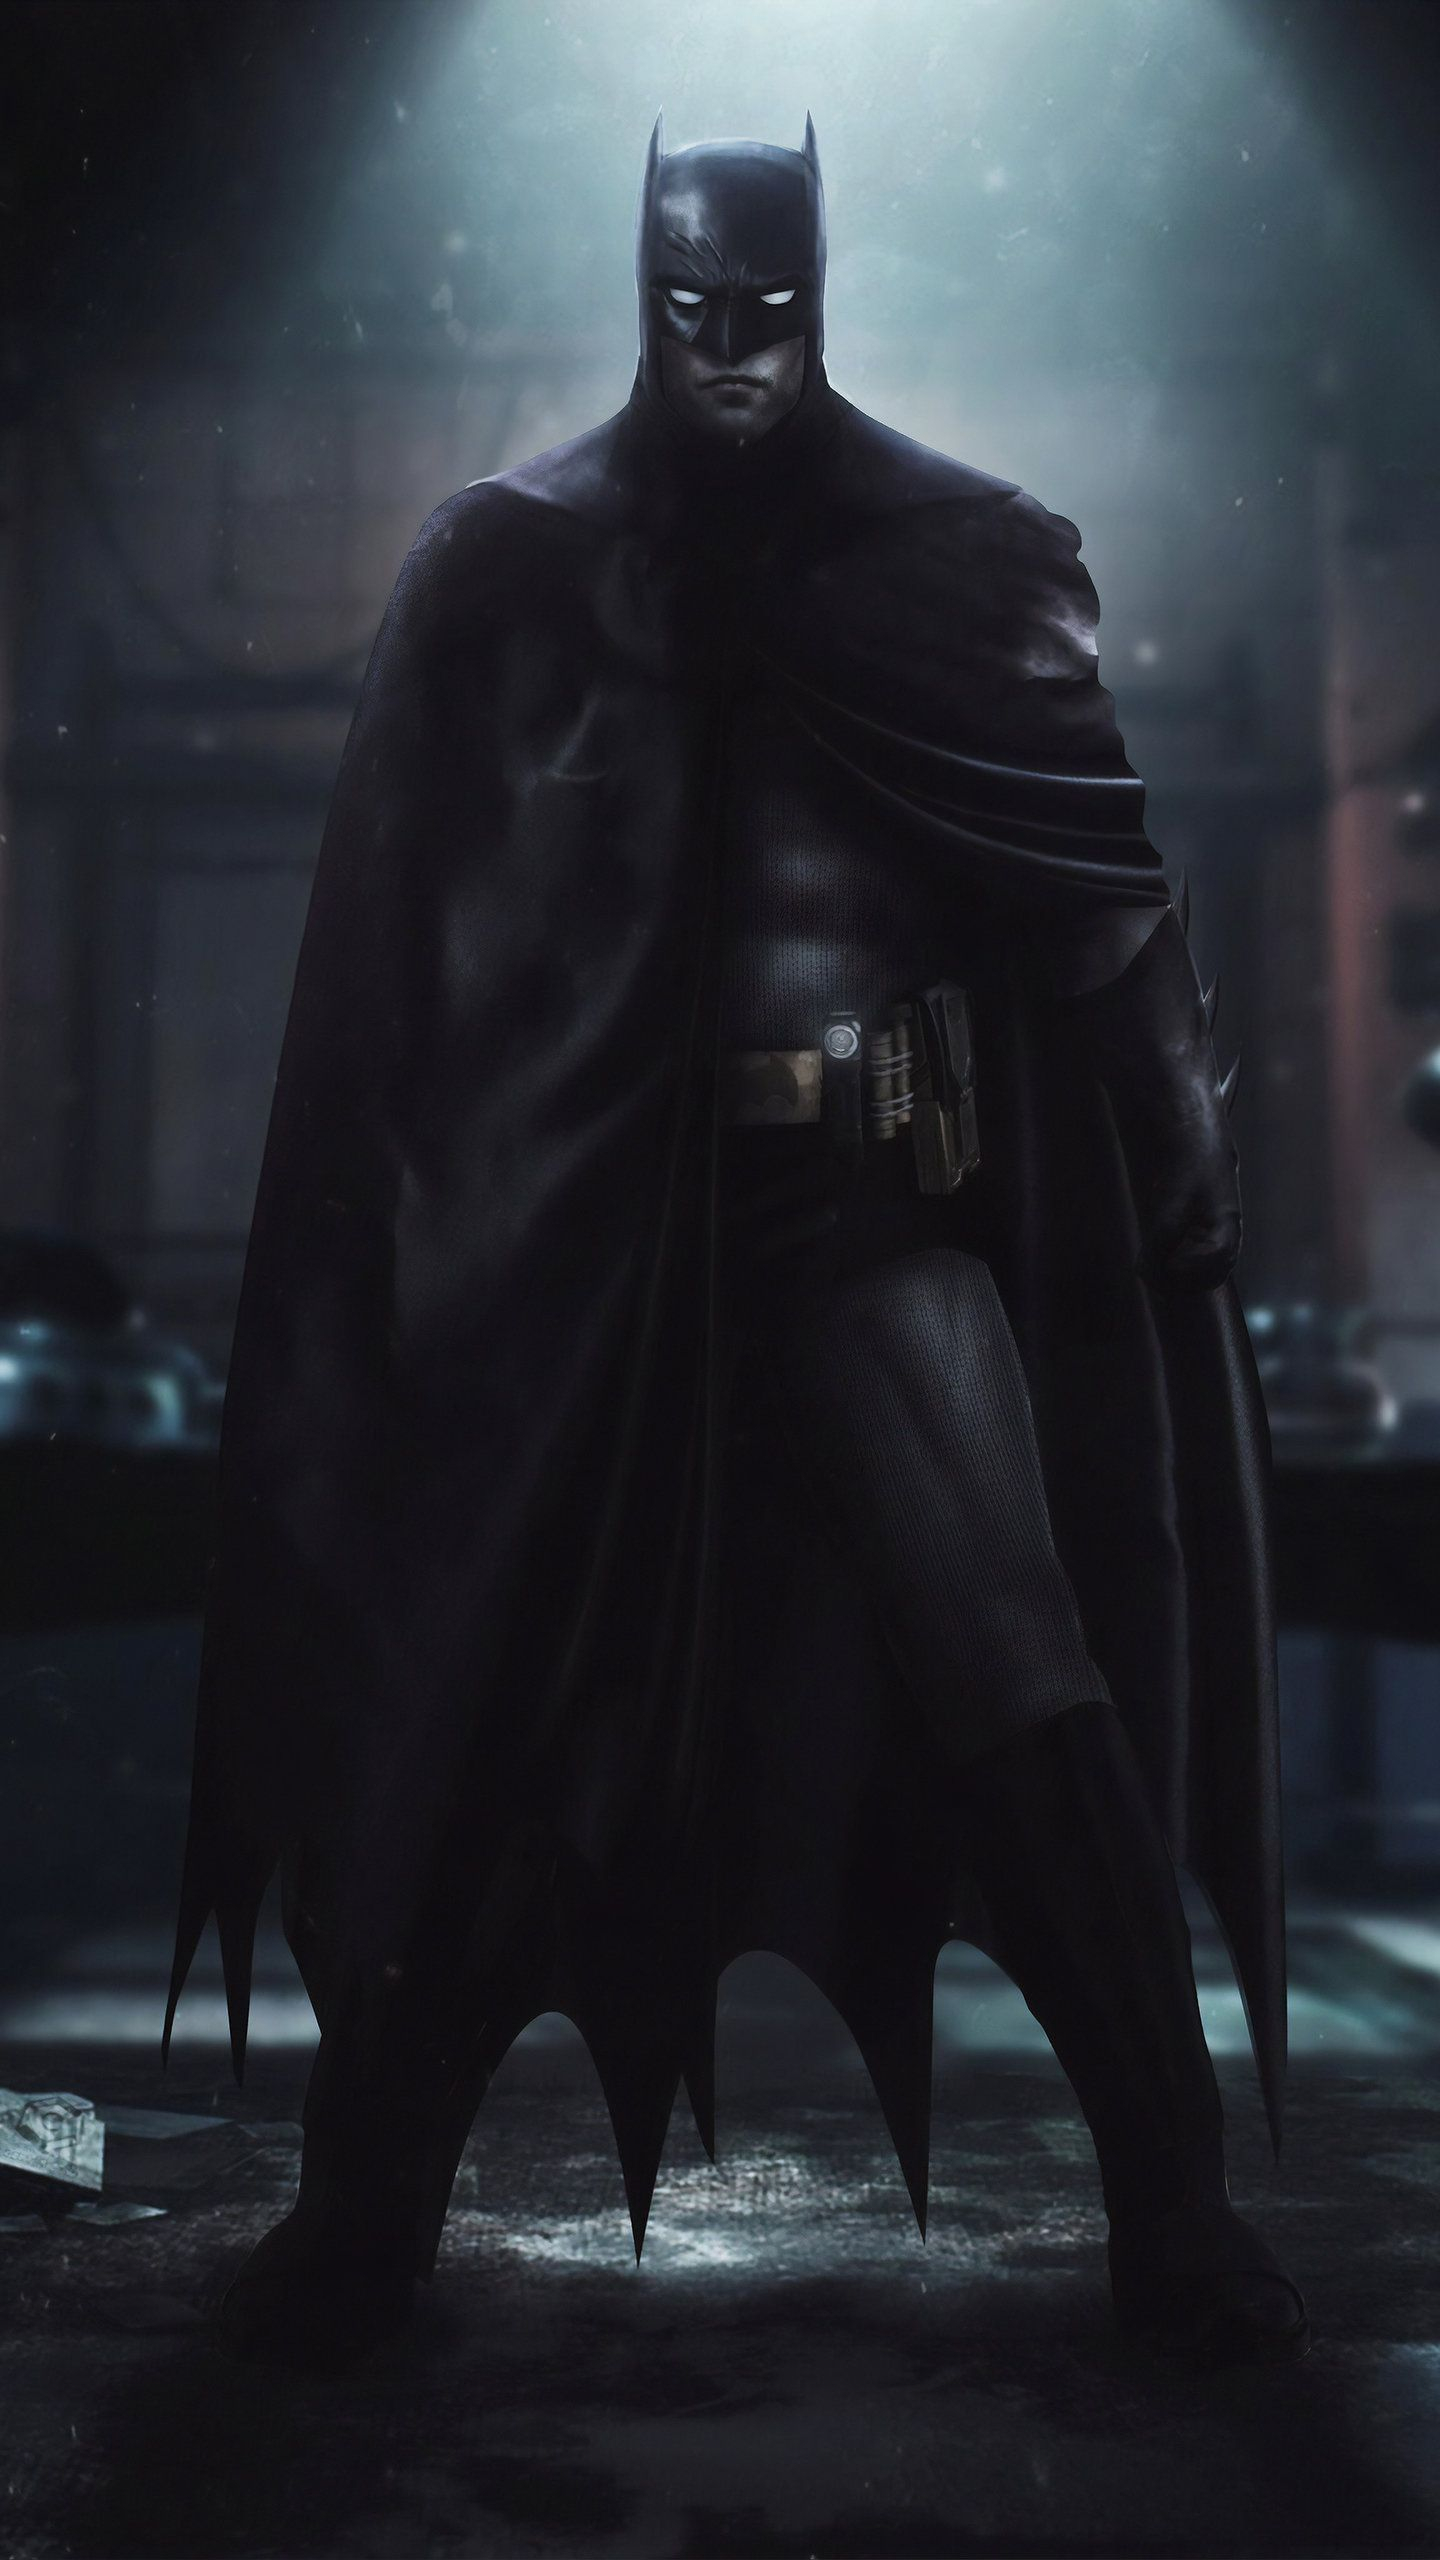 Robert Pattinson As Batman HD Wallpapers 1440x2560